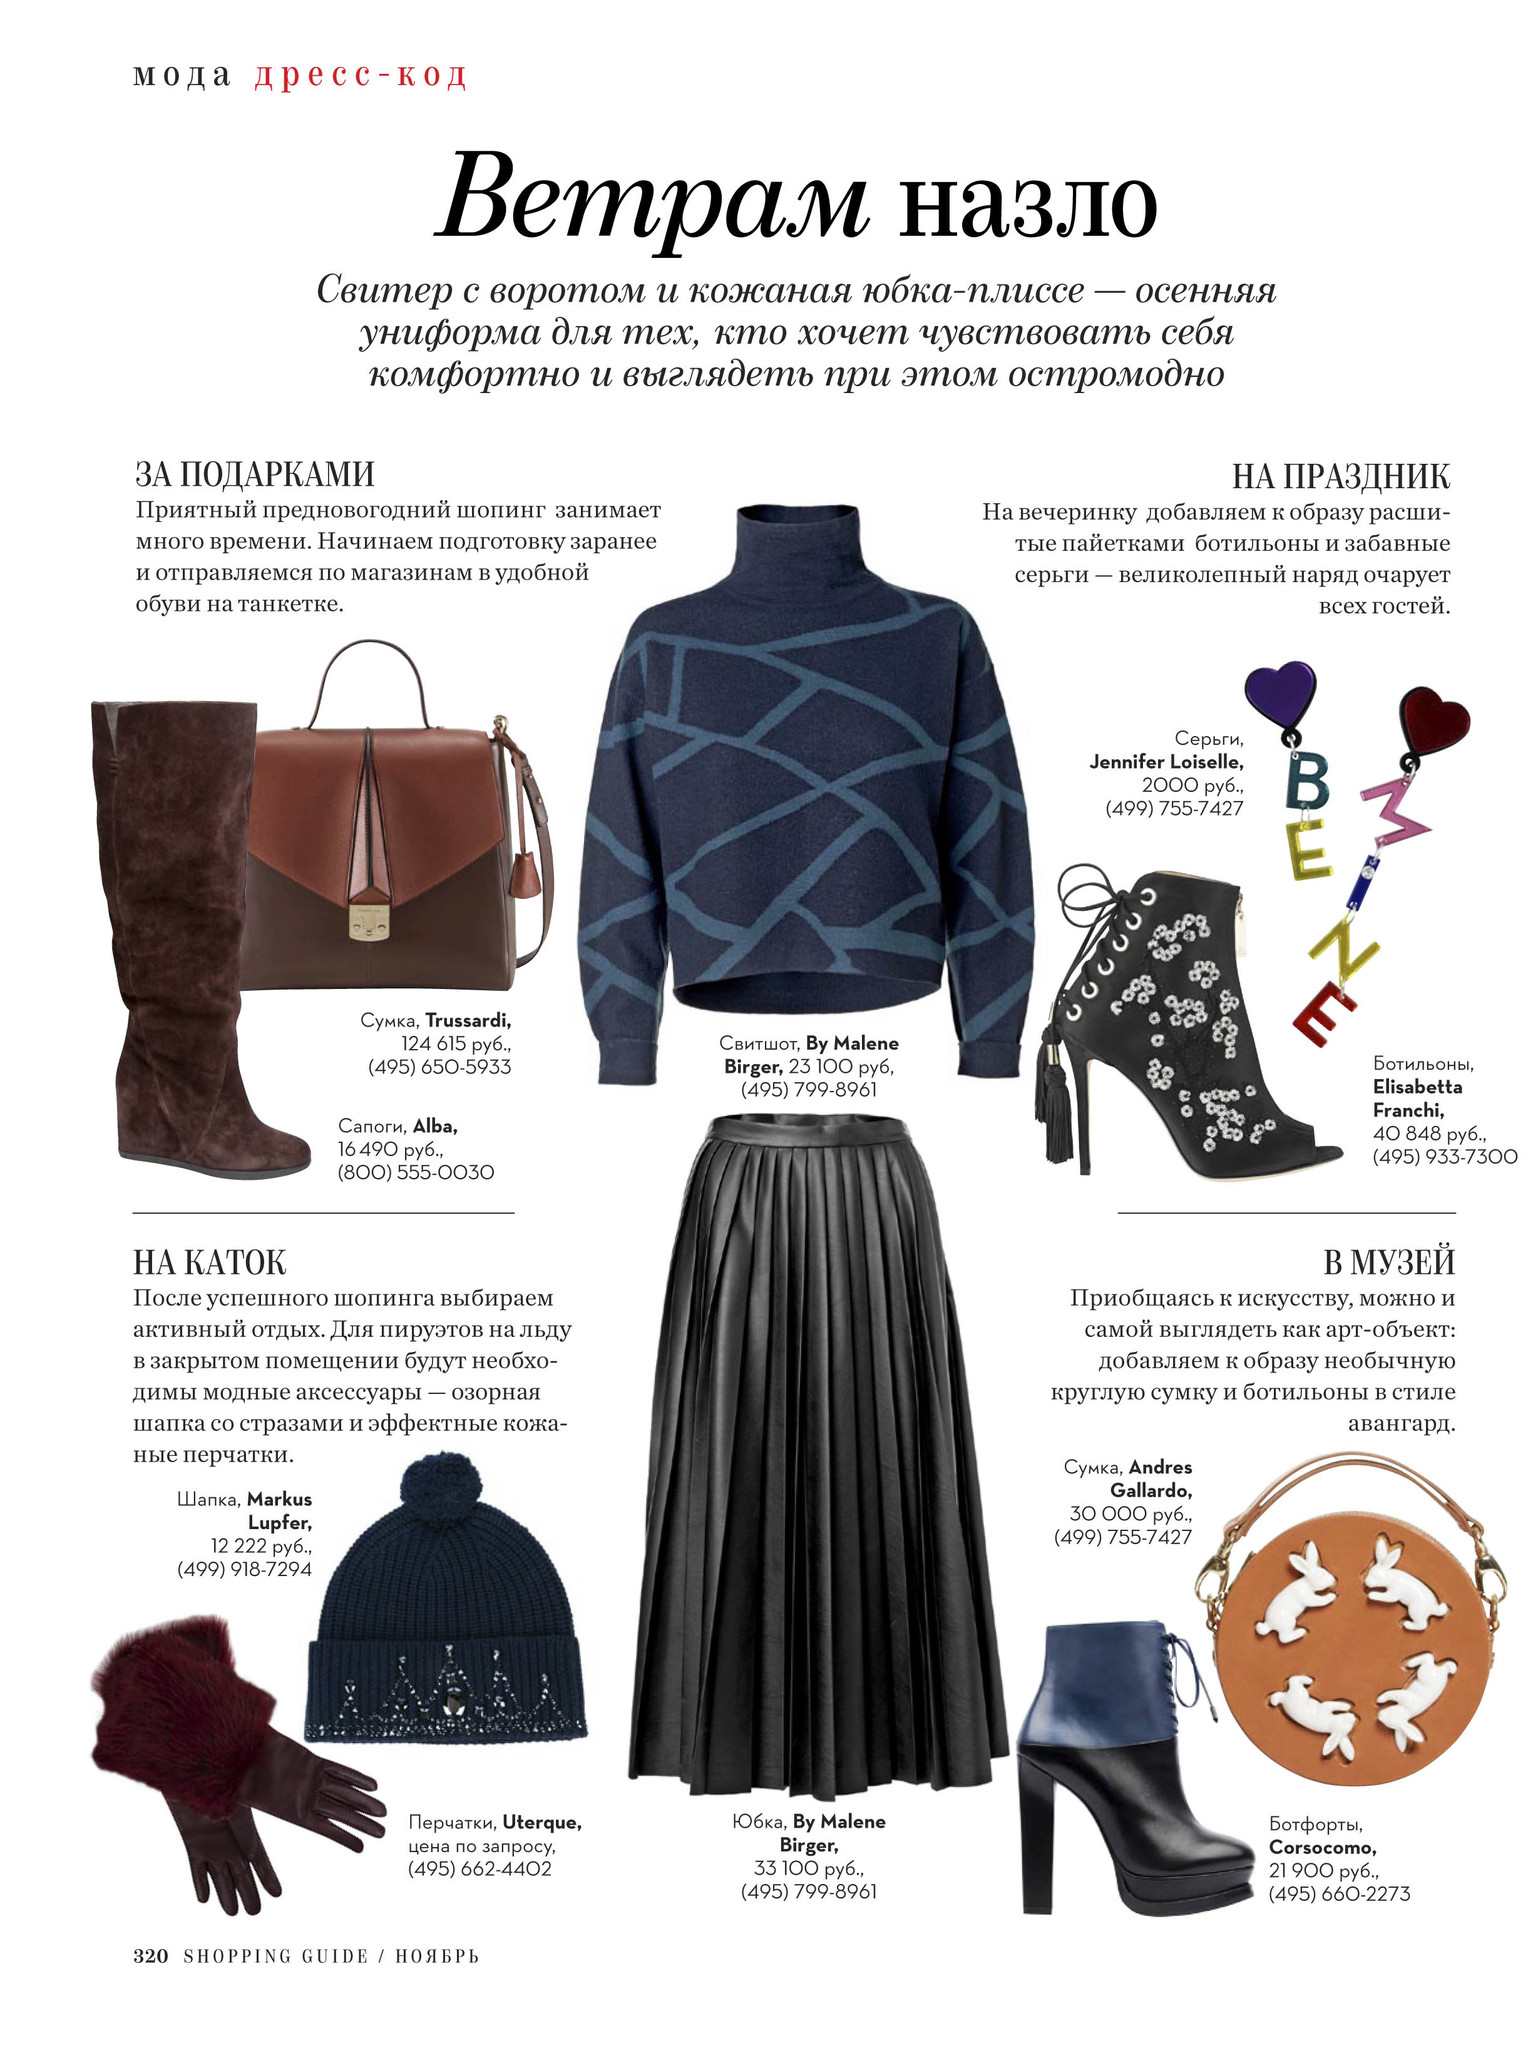 Серьги Be Mine от Jennifer Loiselle и Сумка Round Rabbits Mini от Andres Gallardo в ноябрьском выпуске Shopping Guide